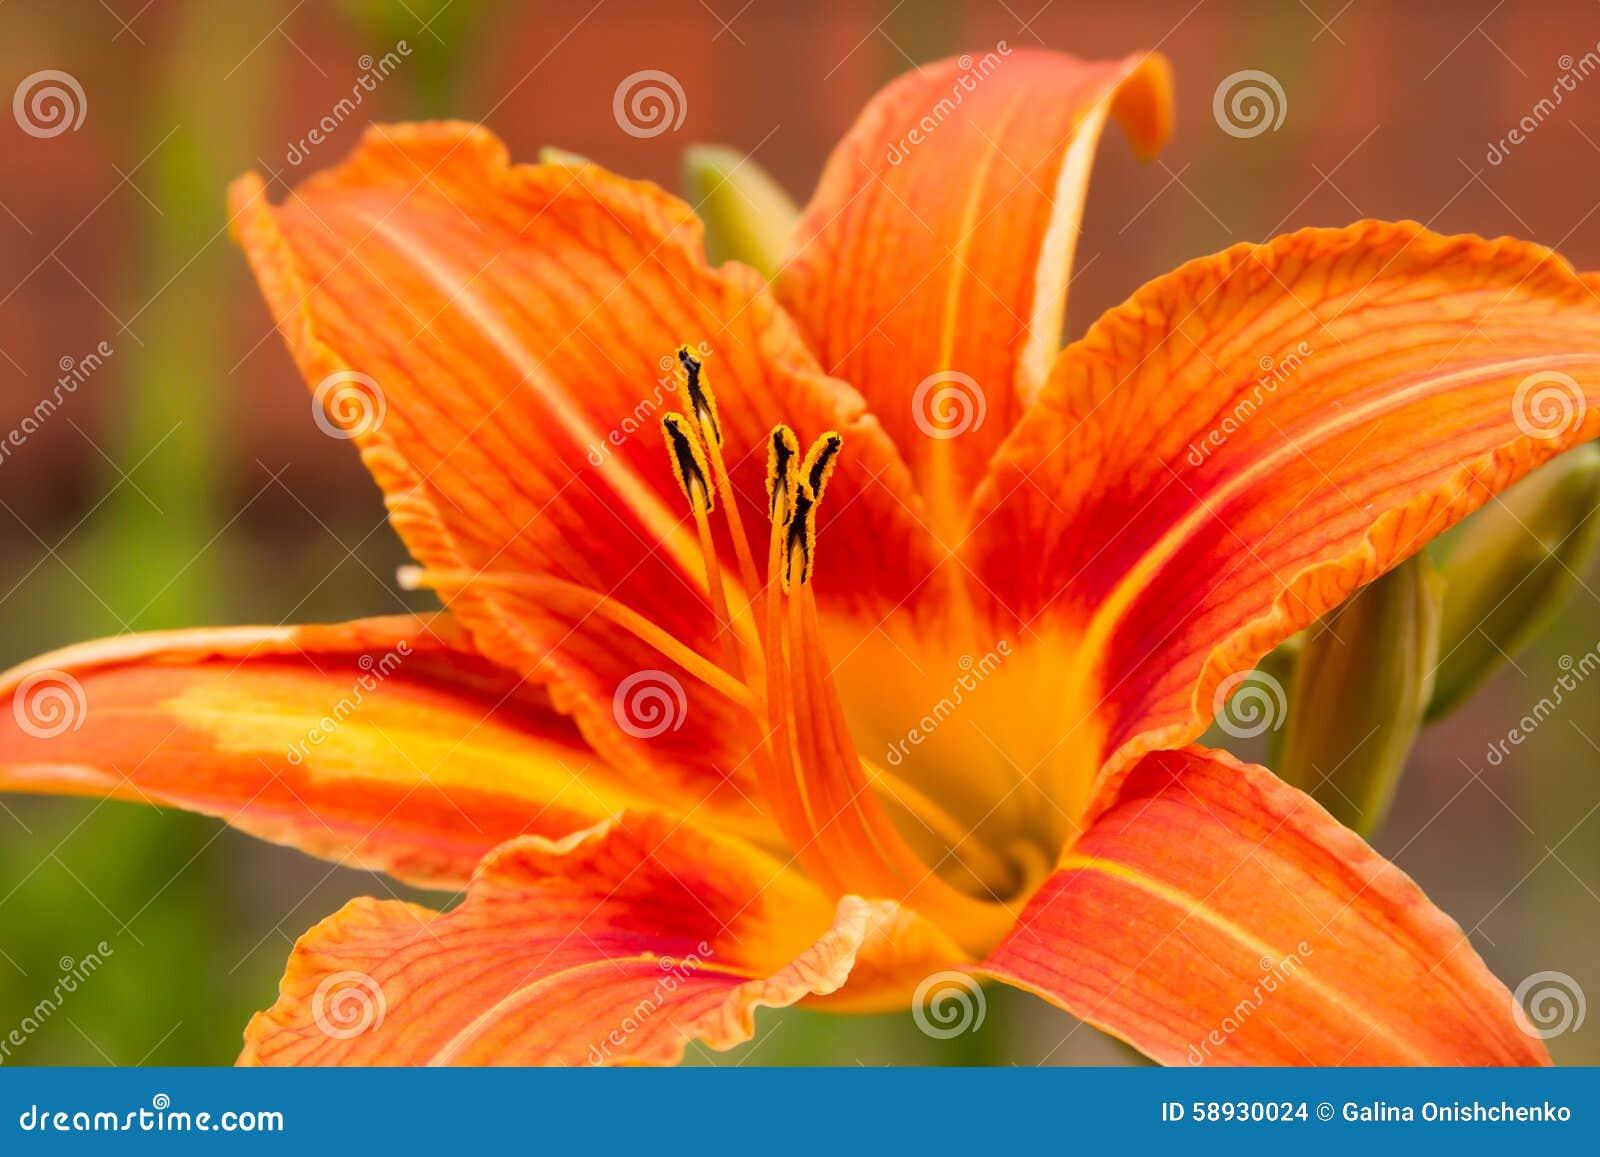 Bright orange flowers of lily stock photo image of petals summer download bright orange flowers of lily stock photo image of petals summer 58930024 izmirmasajfo